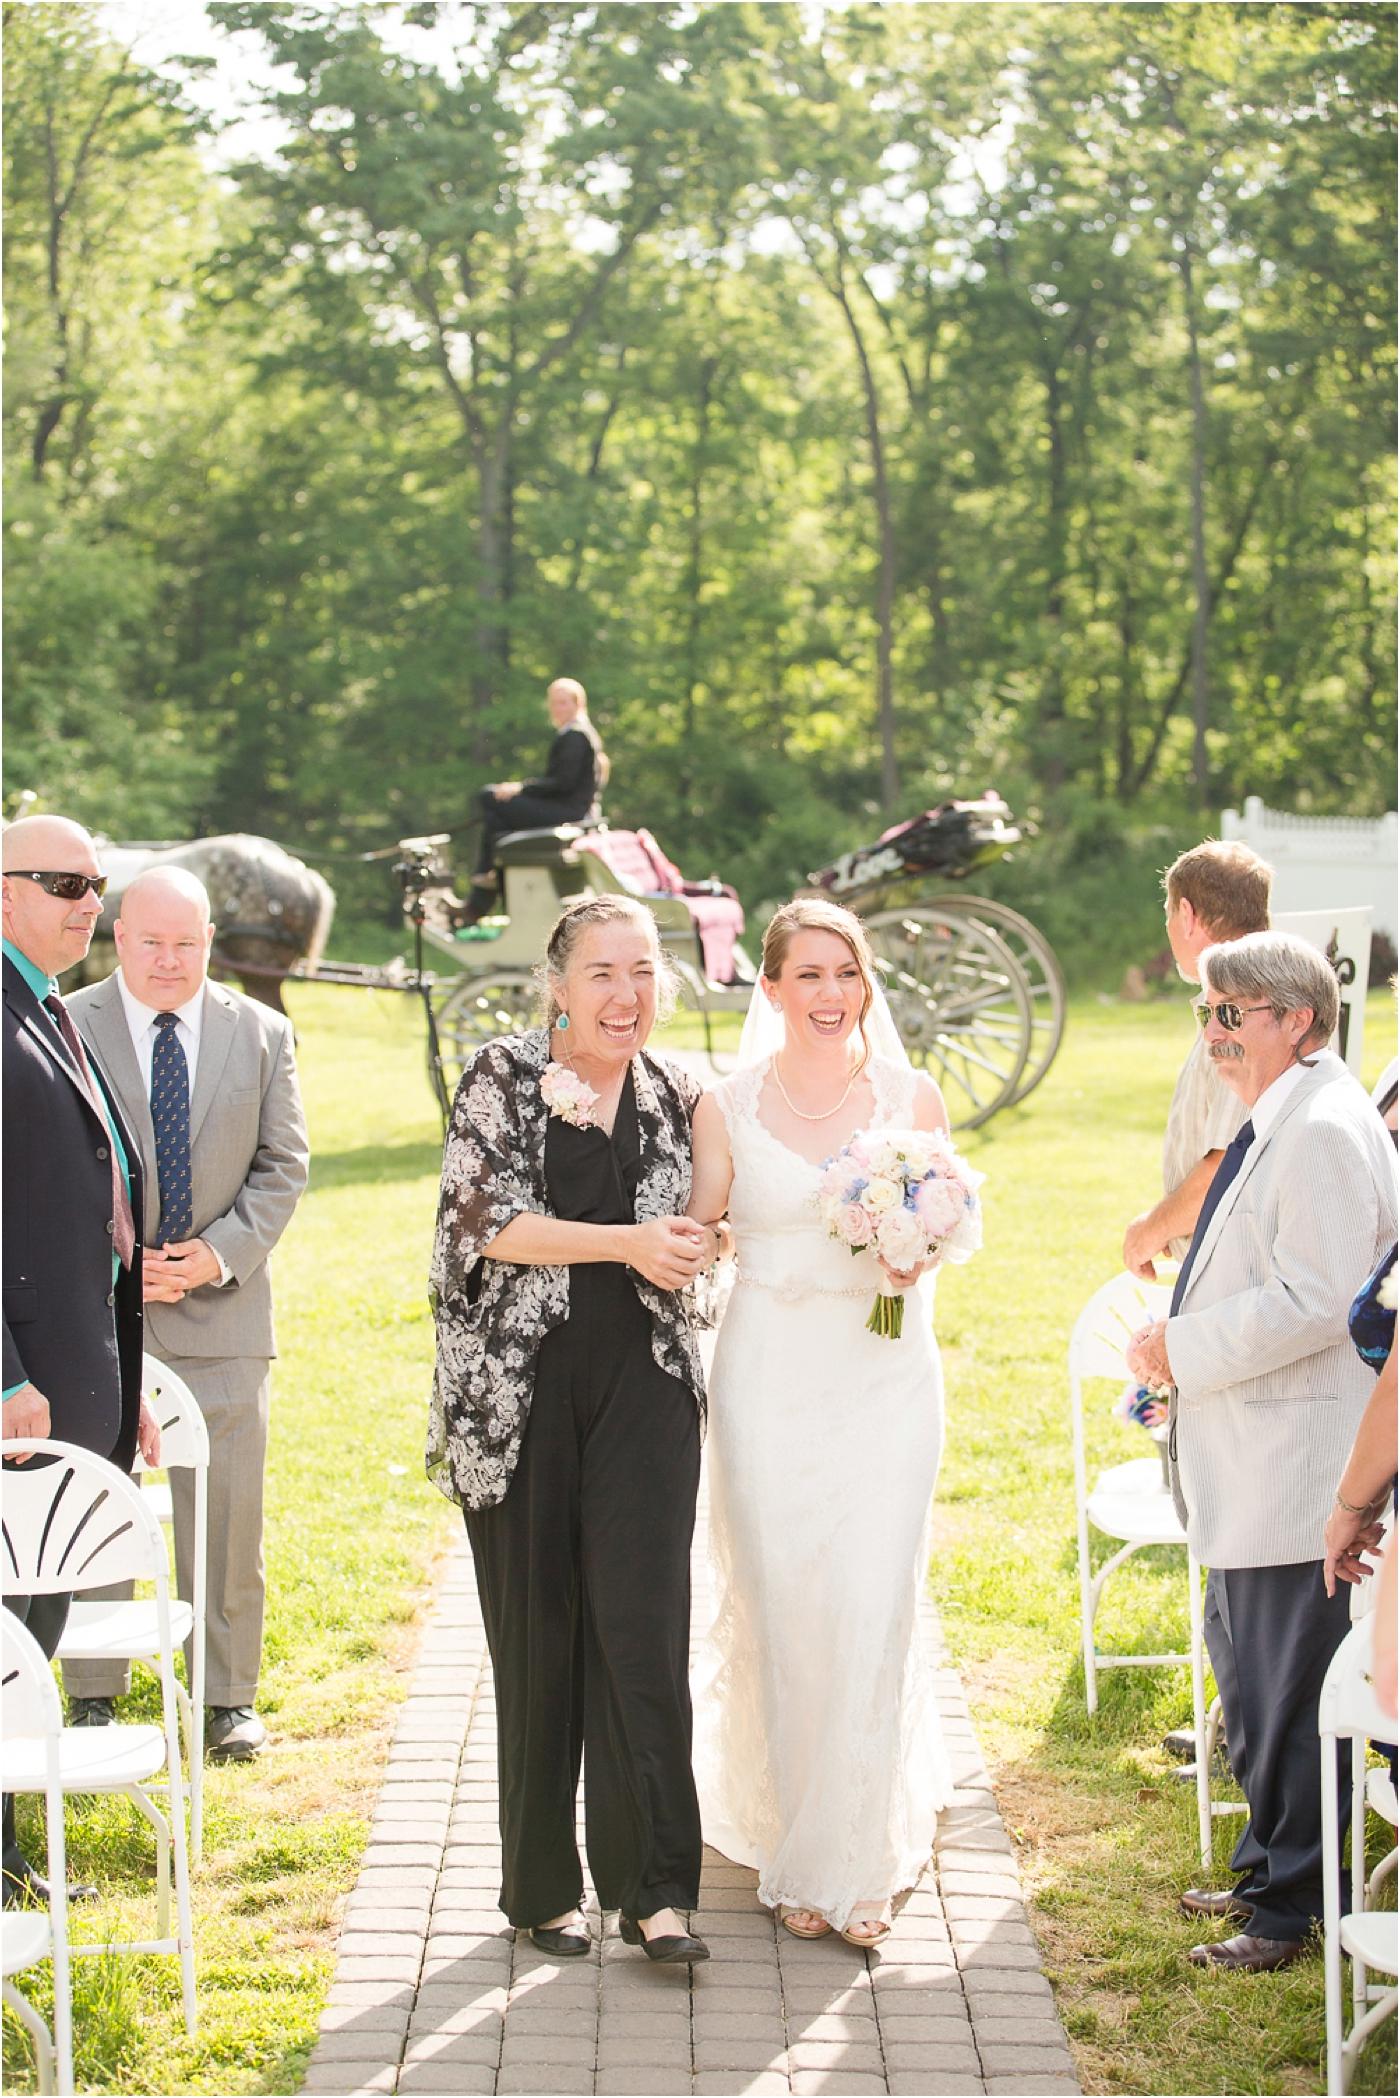 Gettysburg-lodges-wedding-photos-51.jpg